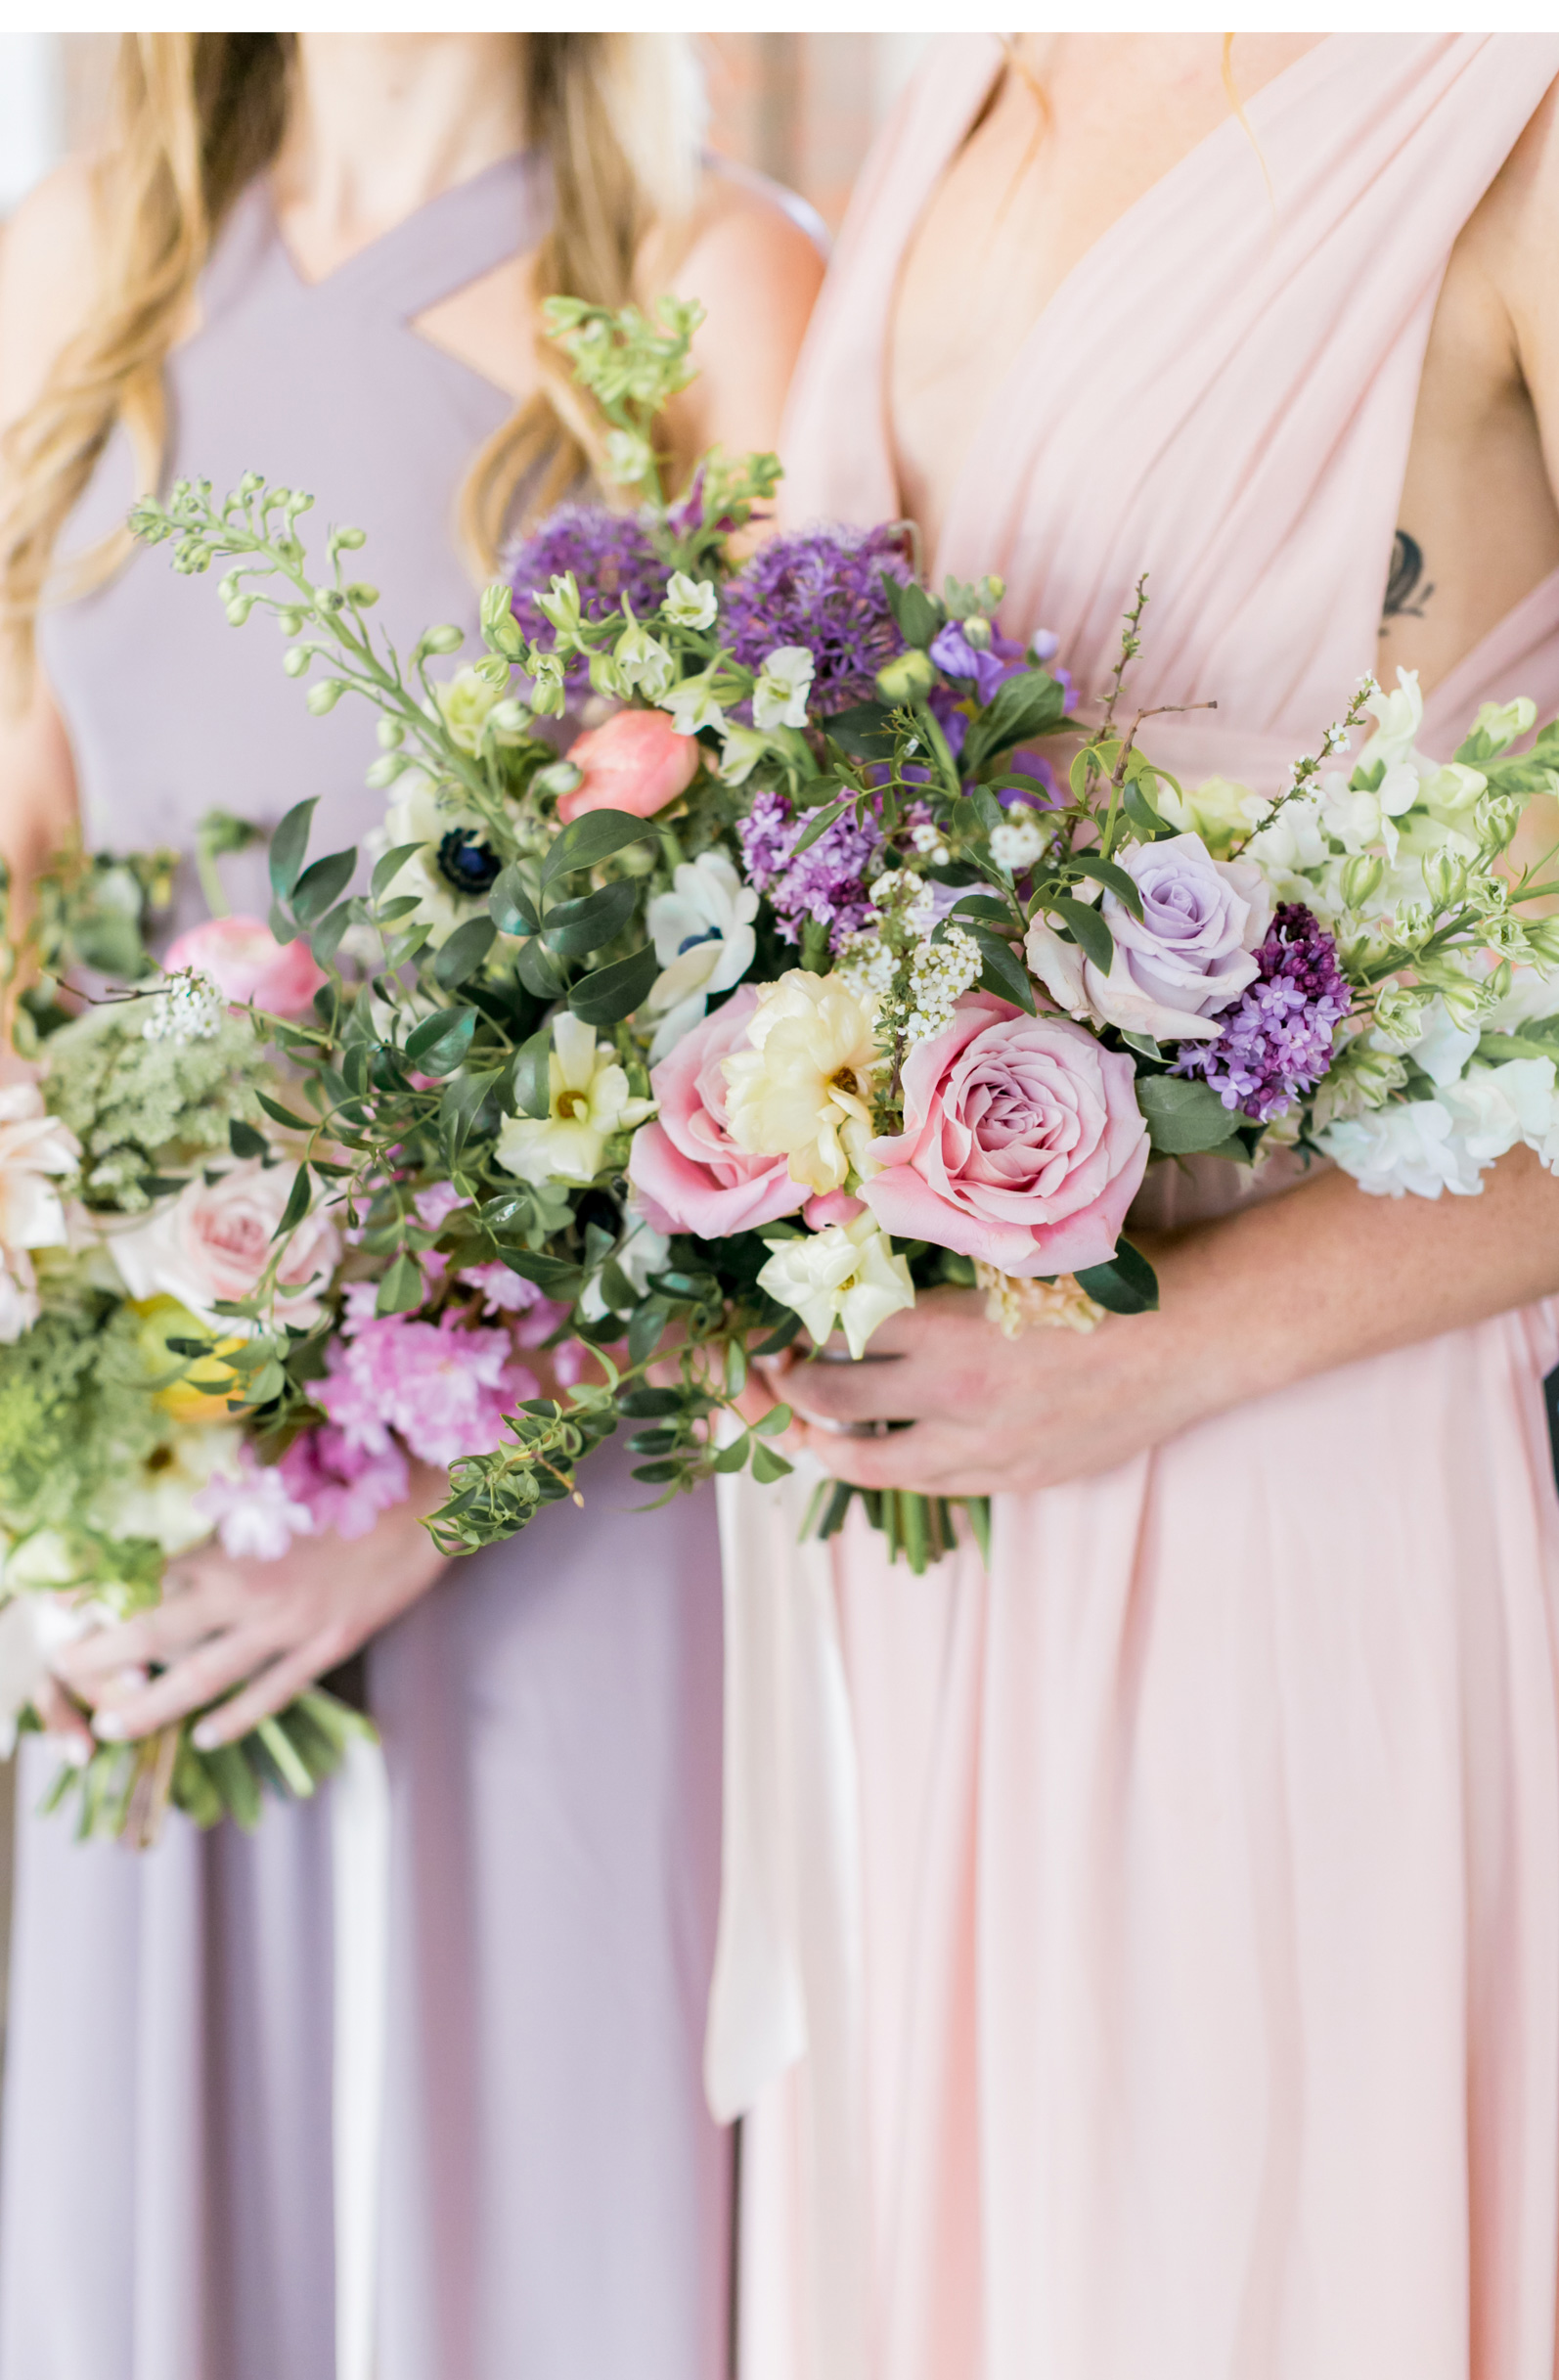 Malibu-Weddings-Natalie-Schutt-Photography-Style-me-Pretty_08.jpg